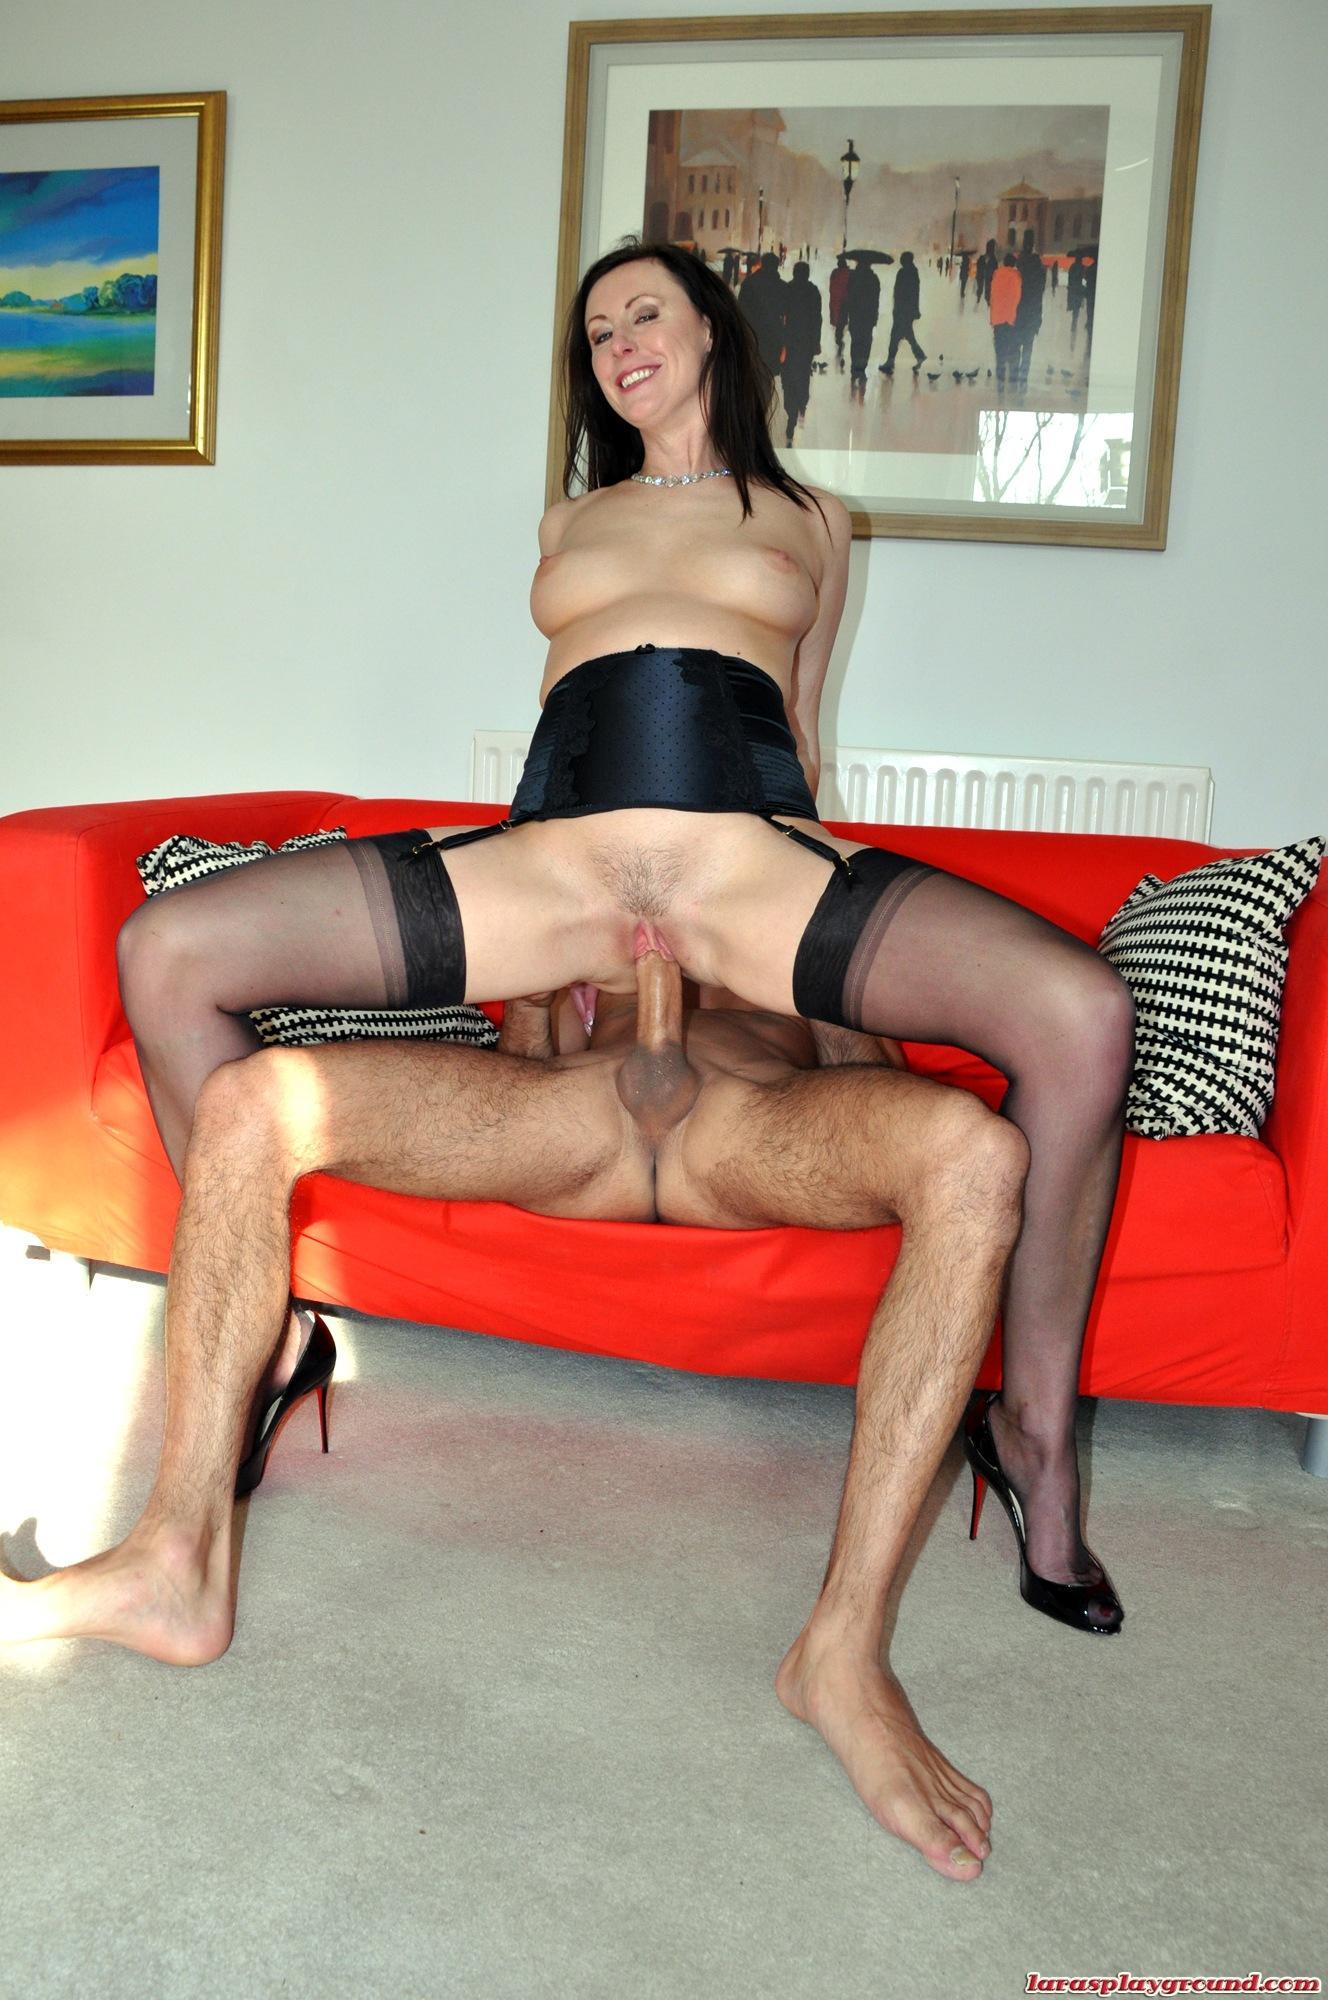 Beautiful brunette opens legs and pleasure pussy 4